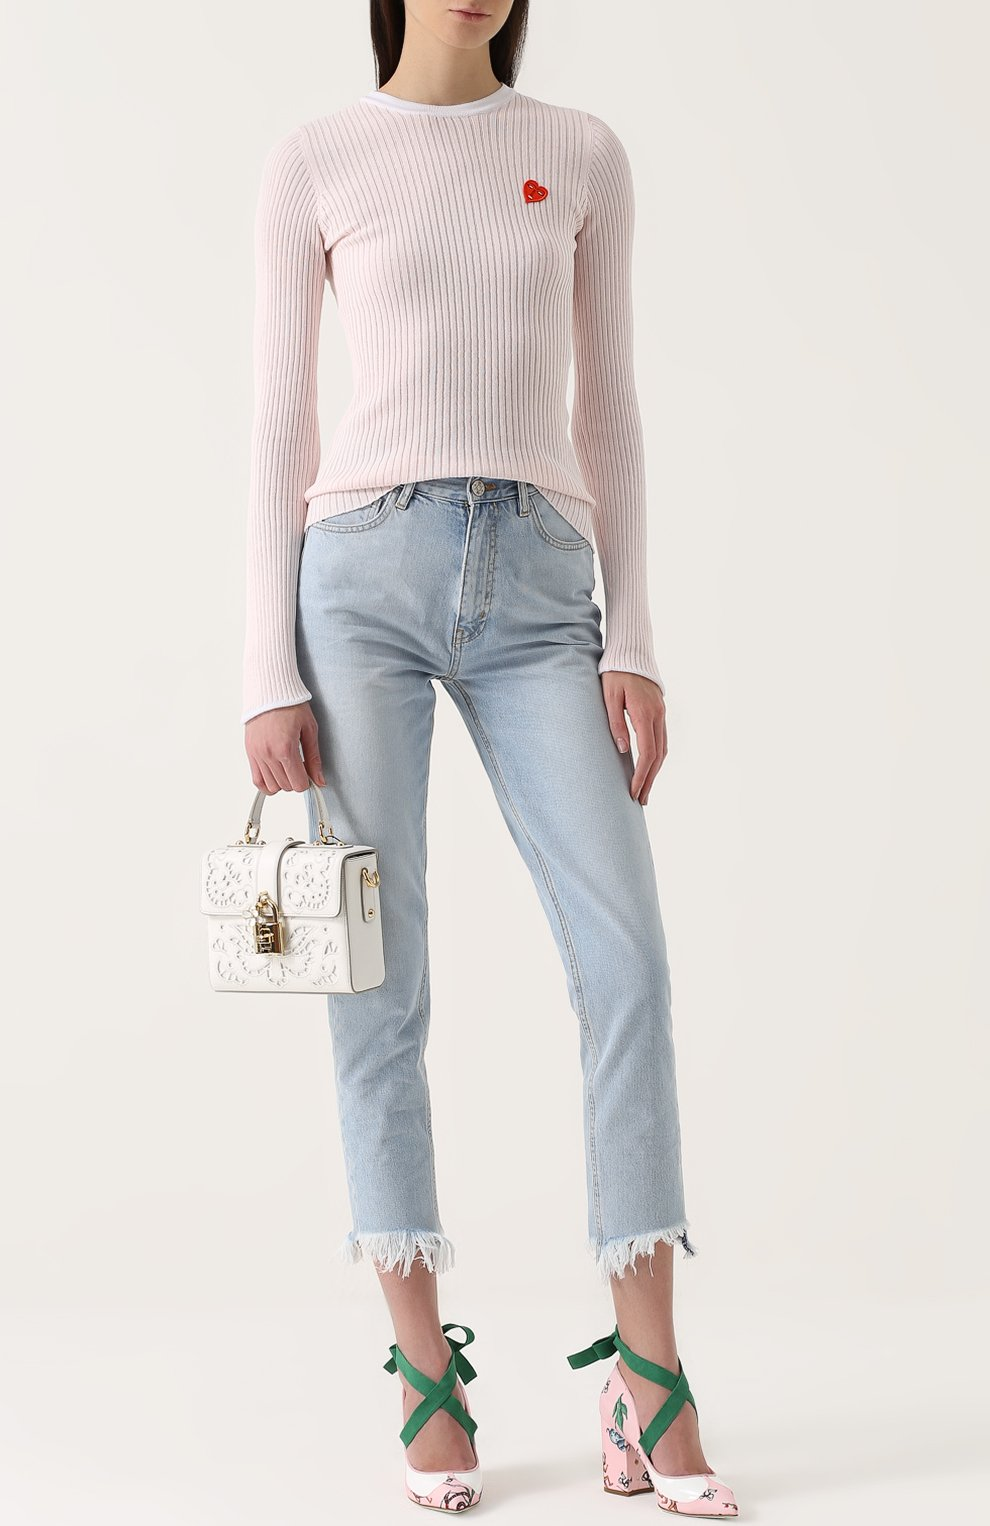 Сумка Dolce Soft с перфорацией Dolce & Gabbana белая цвета | Фото №2